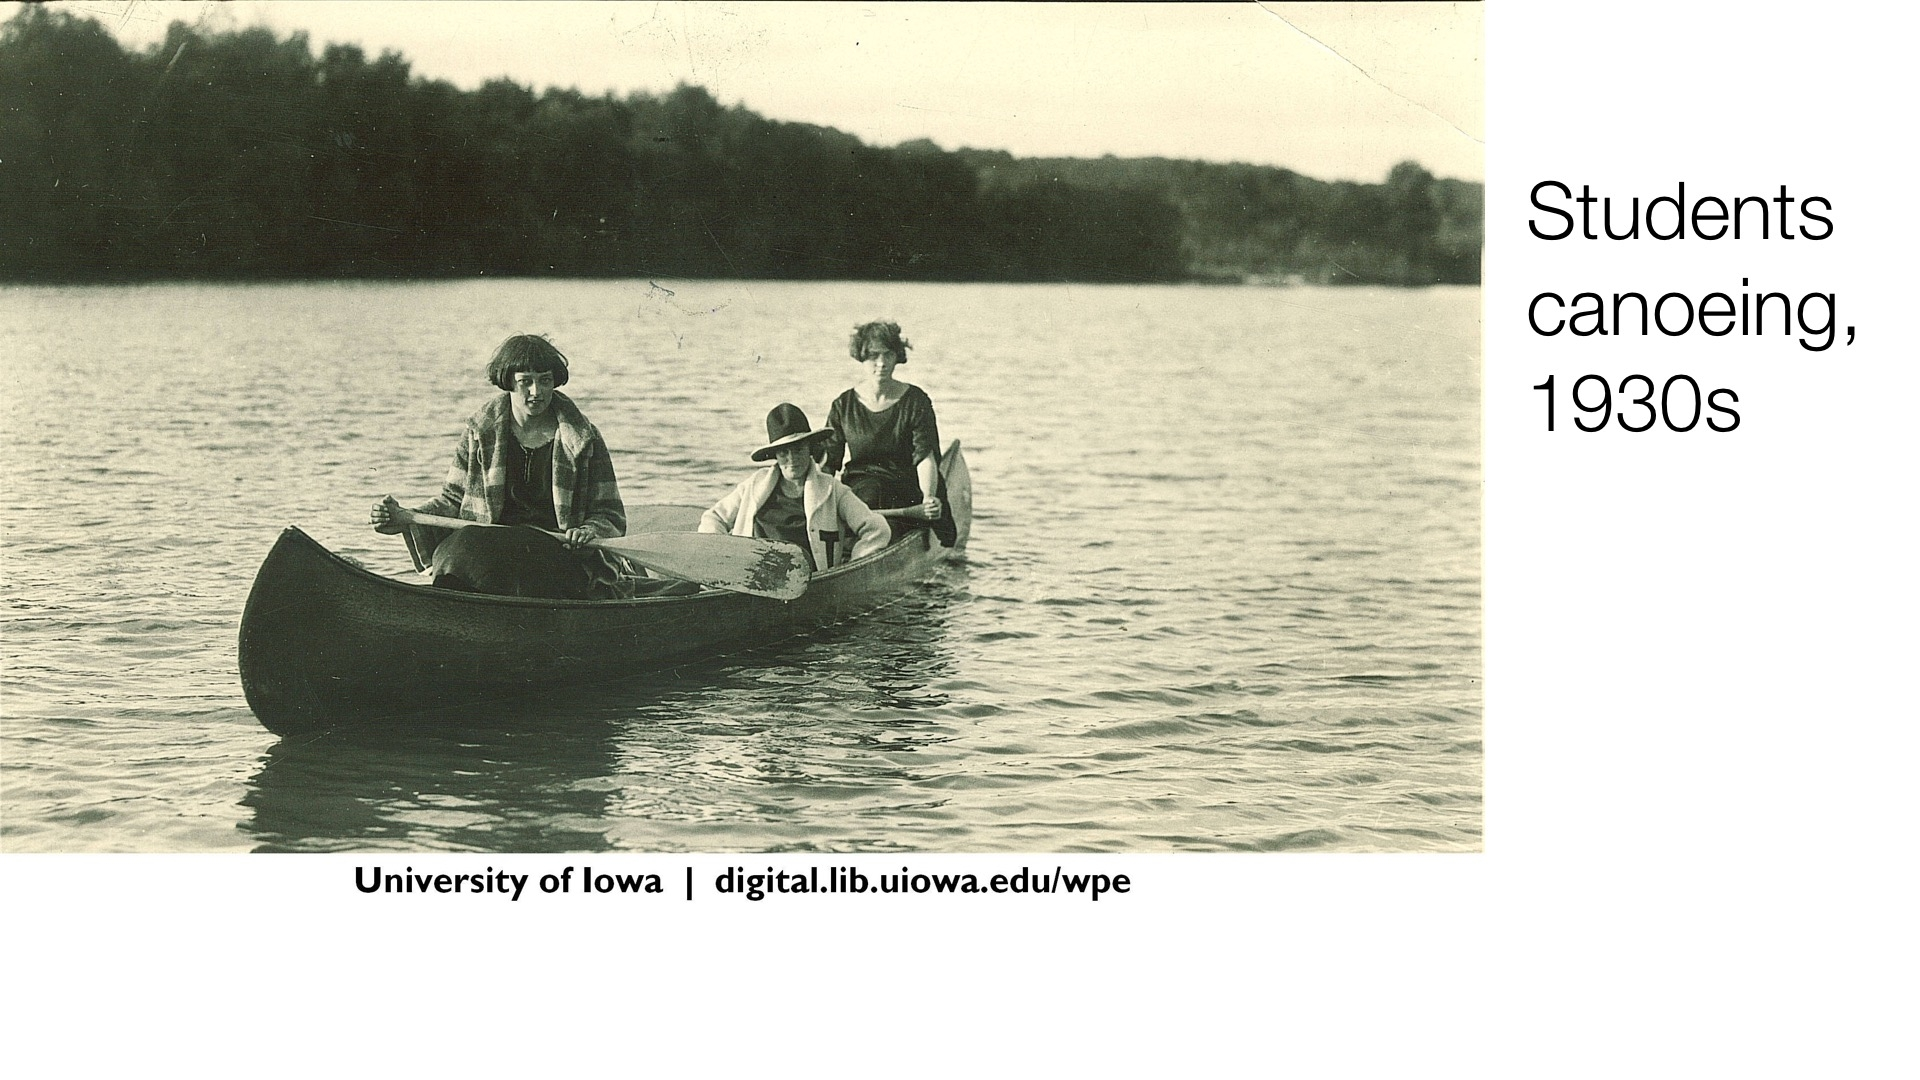 Students canoeing, 1930s